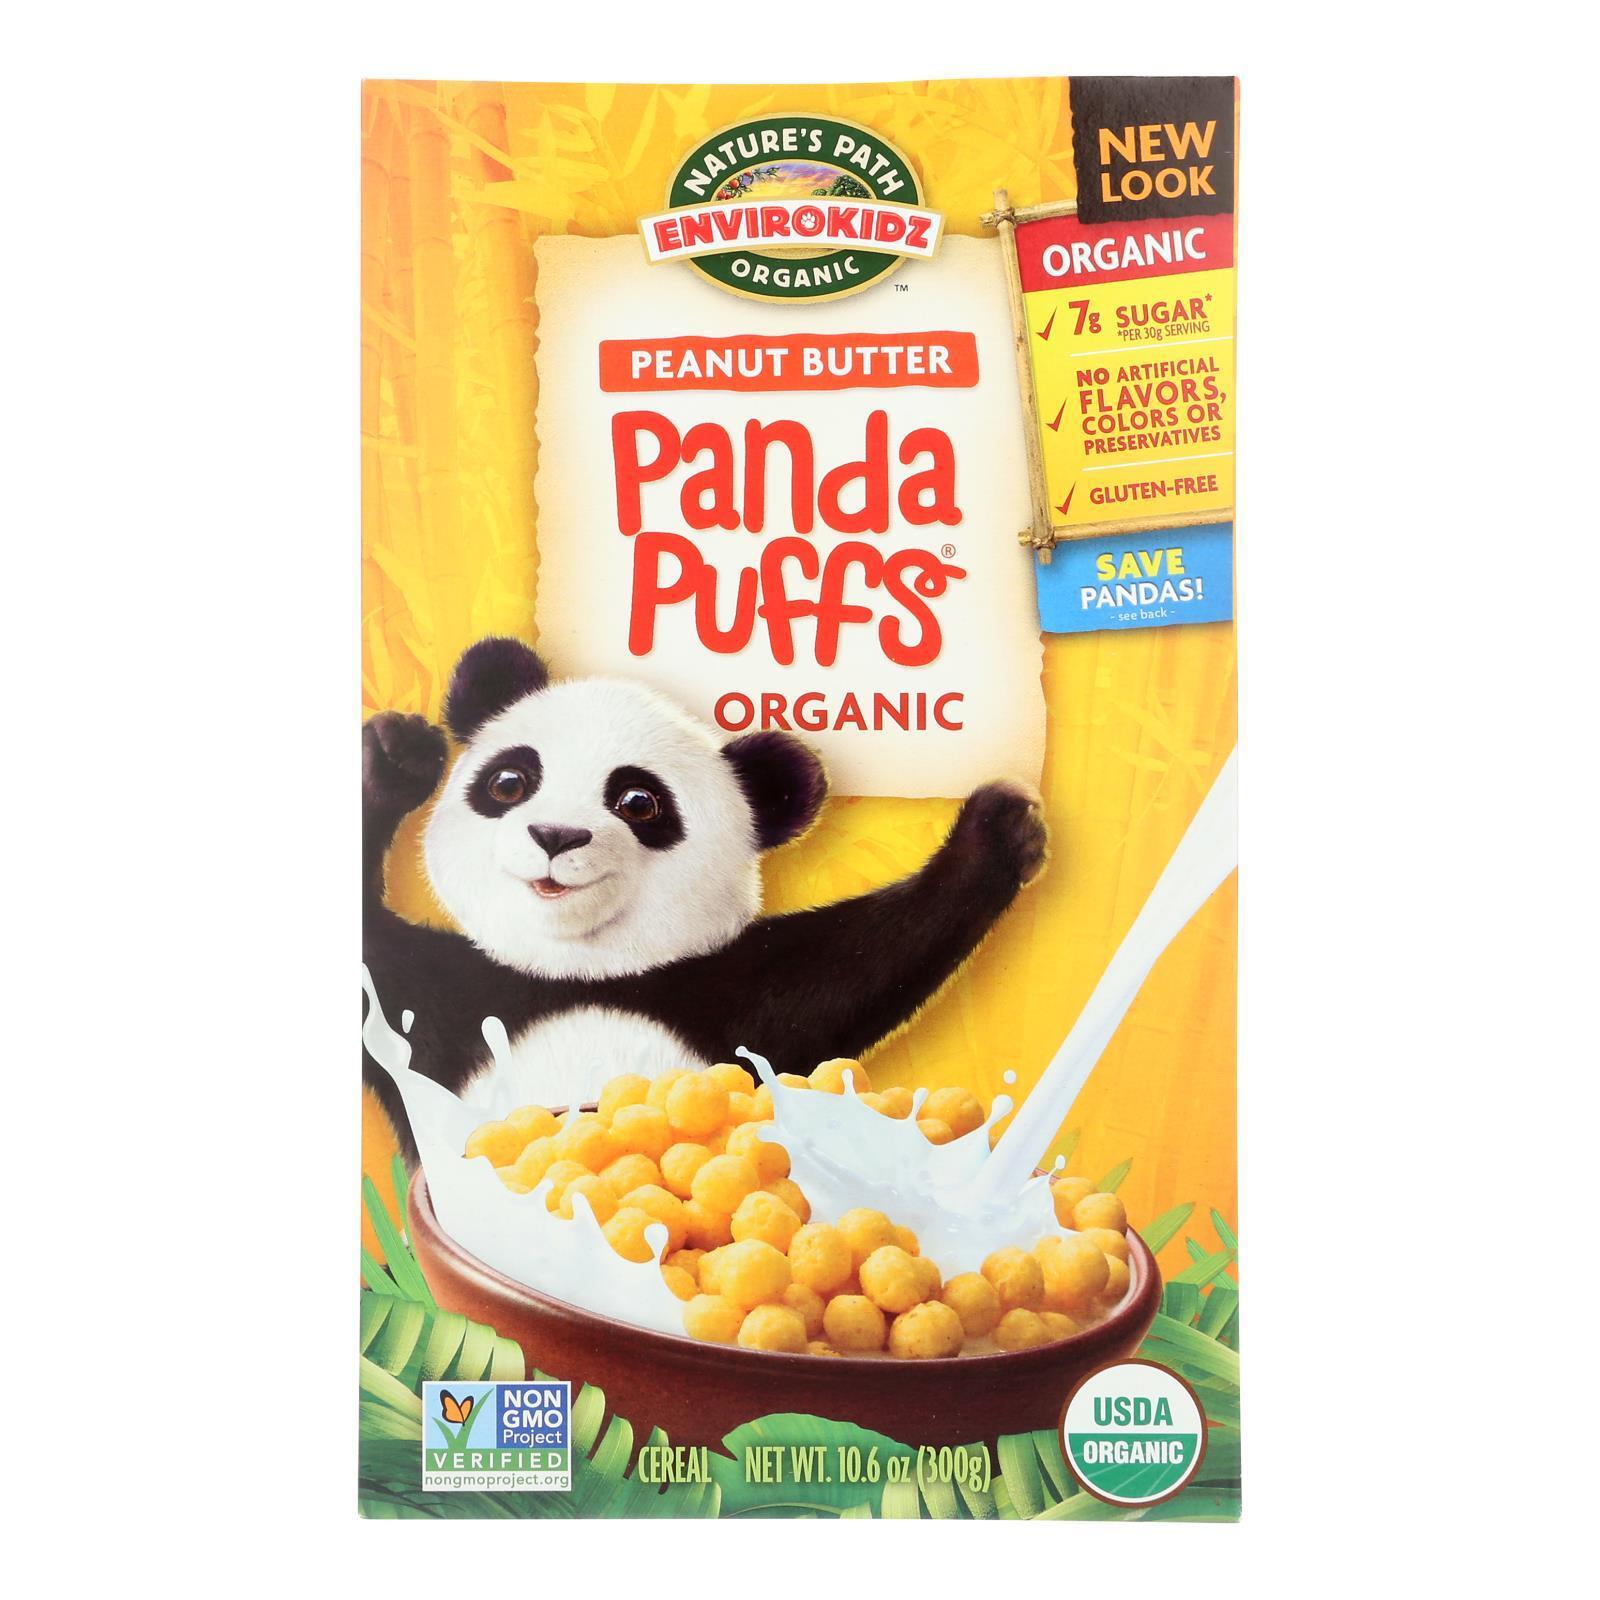 Envirokidz Organic Panda Puffs - Peanut Butter - Case of 12 - 10.6 oz.